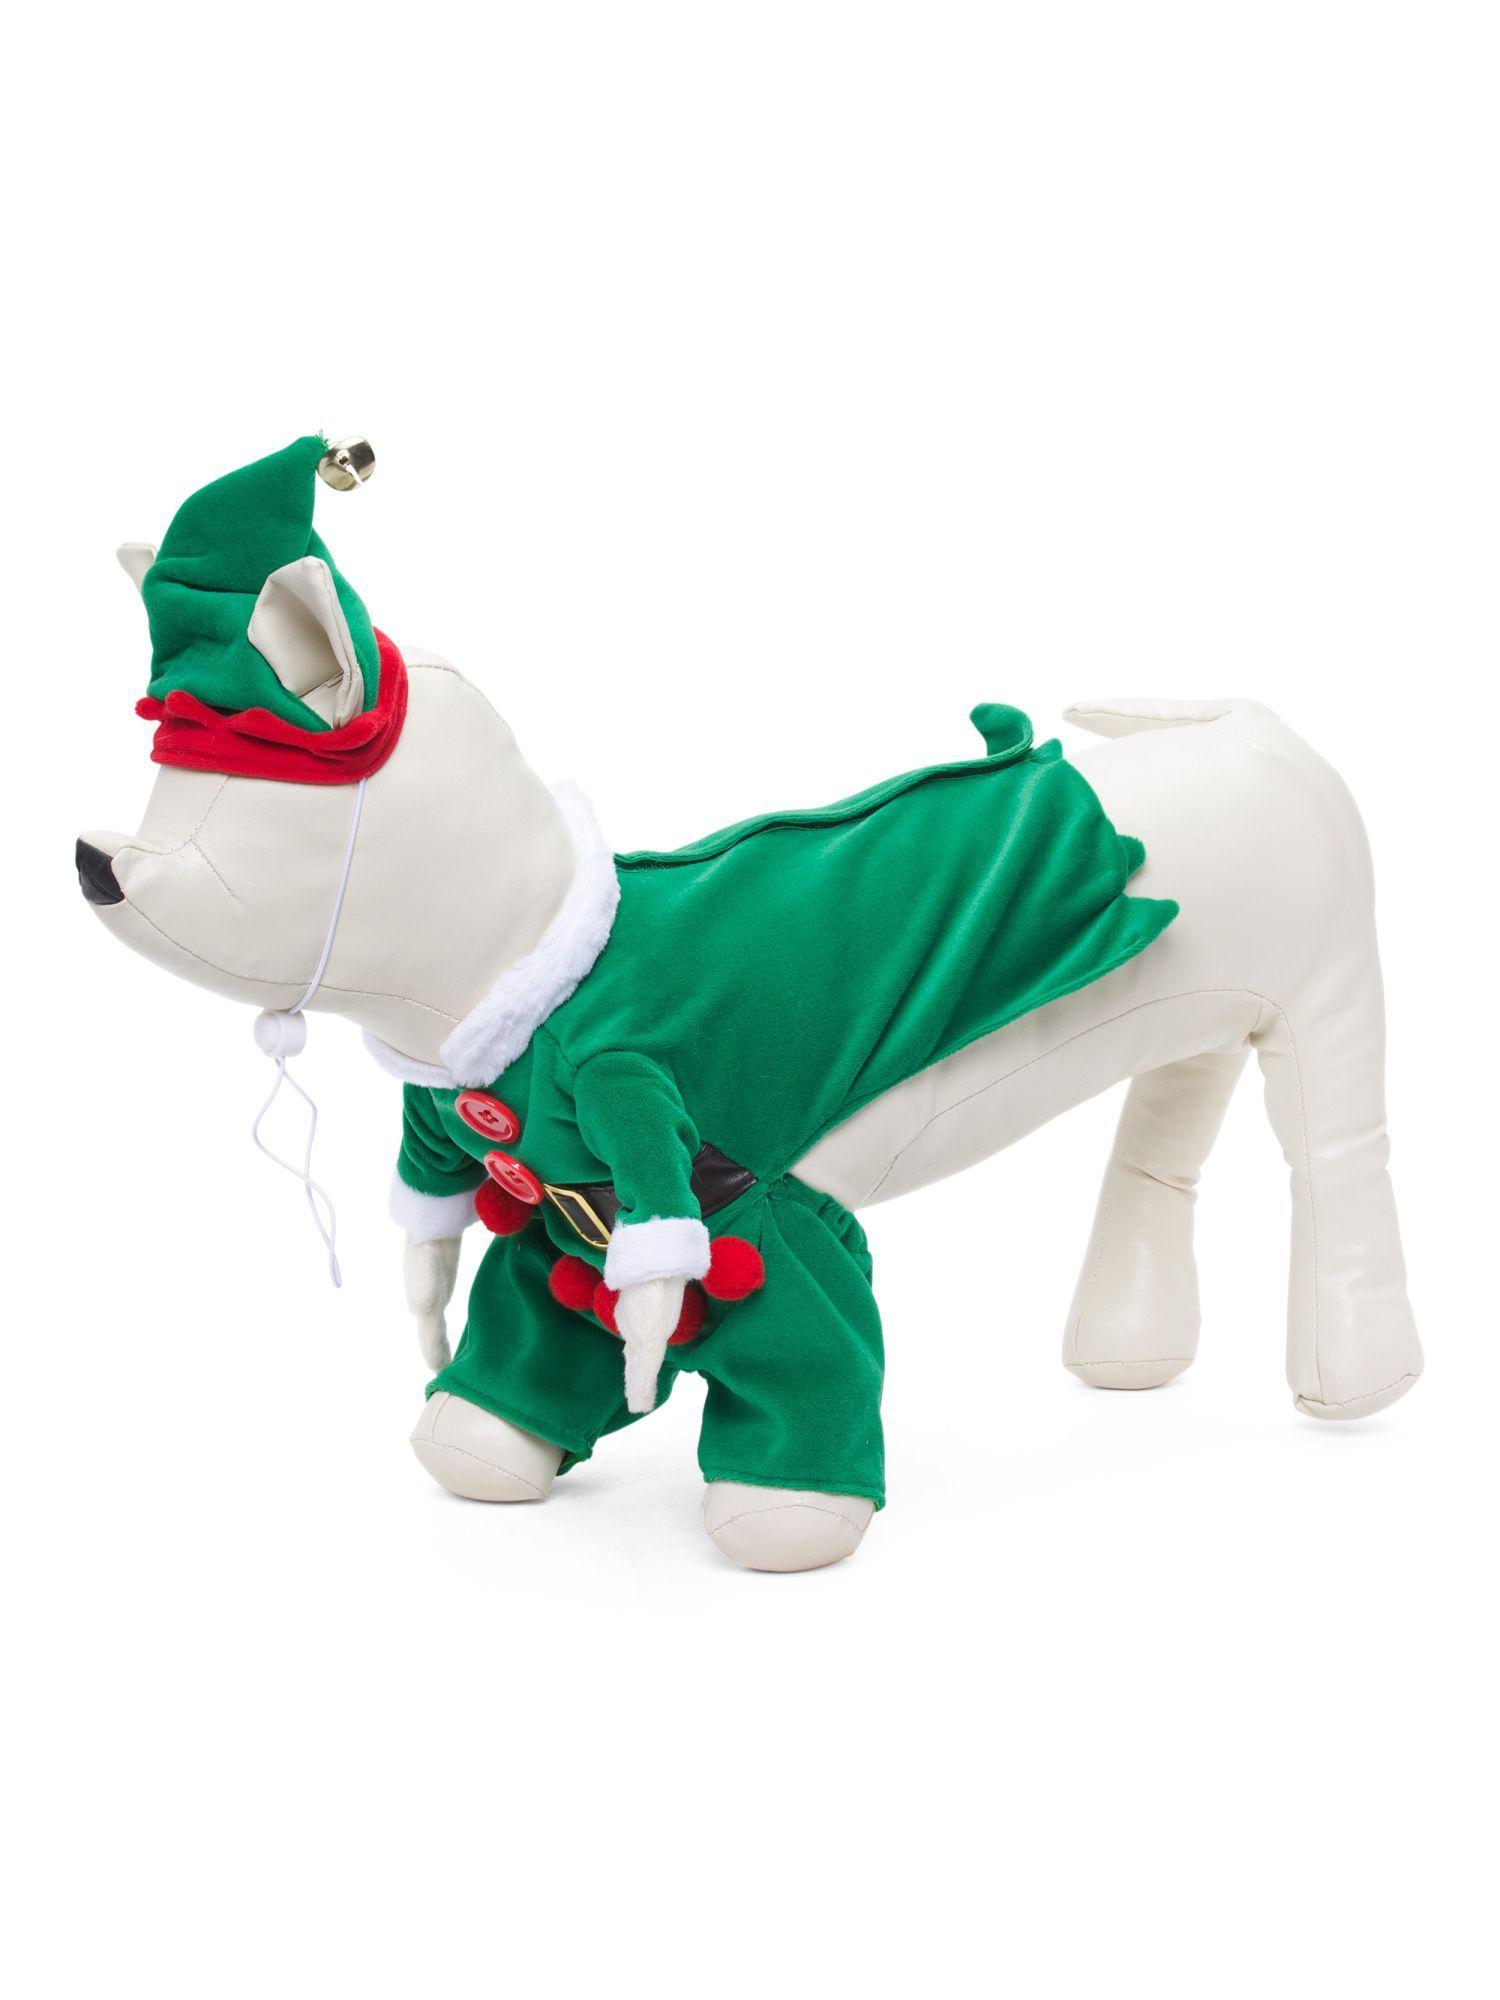 Elf With Legs Dog Costume  sc 1 st  Pinterest & Elf With Legs Dog Costume | Products